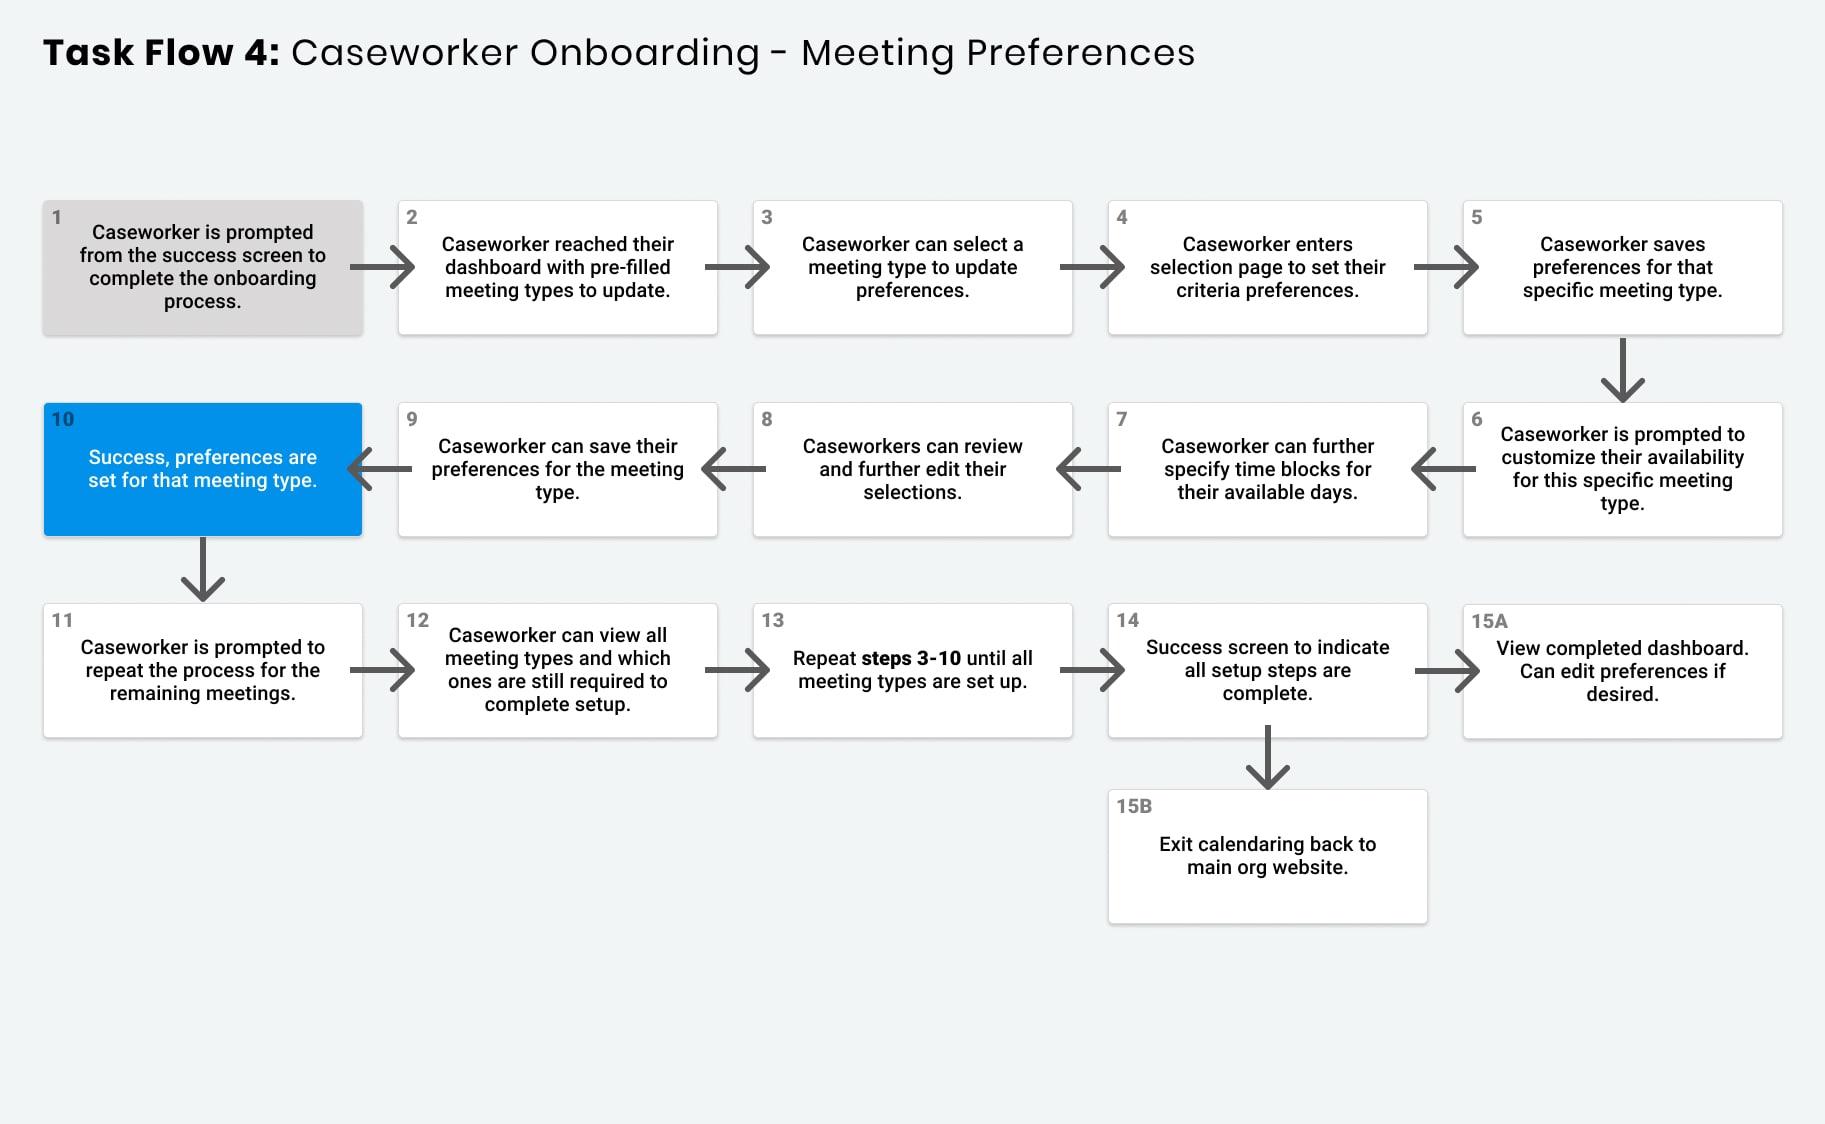 Task Flow Chart detailing meeting preferences